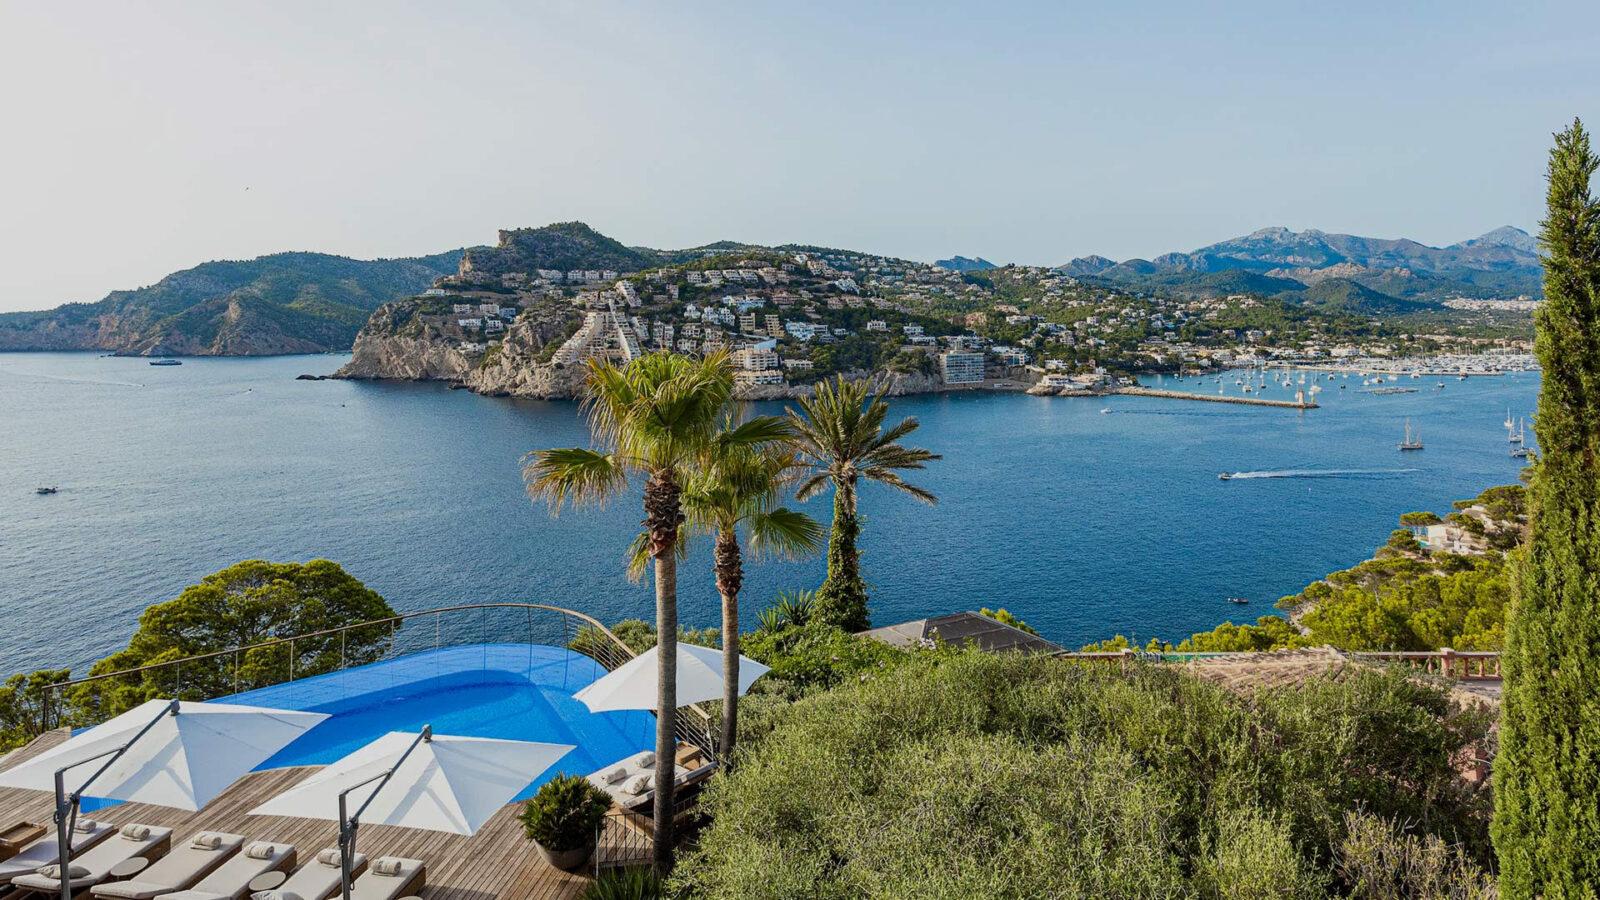 Luxury Hotels in Mallorca